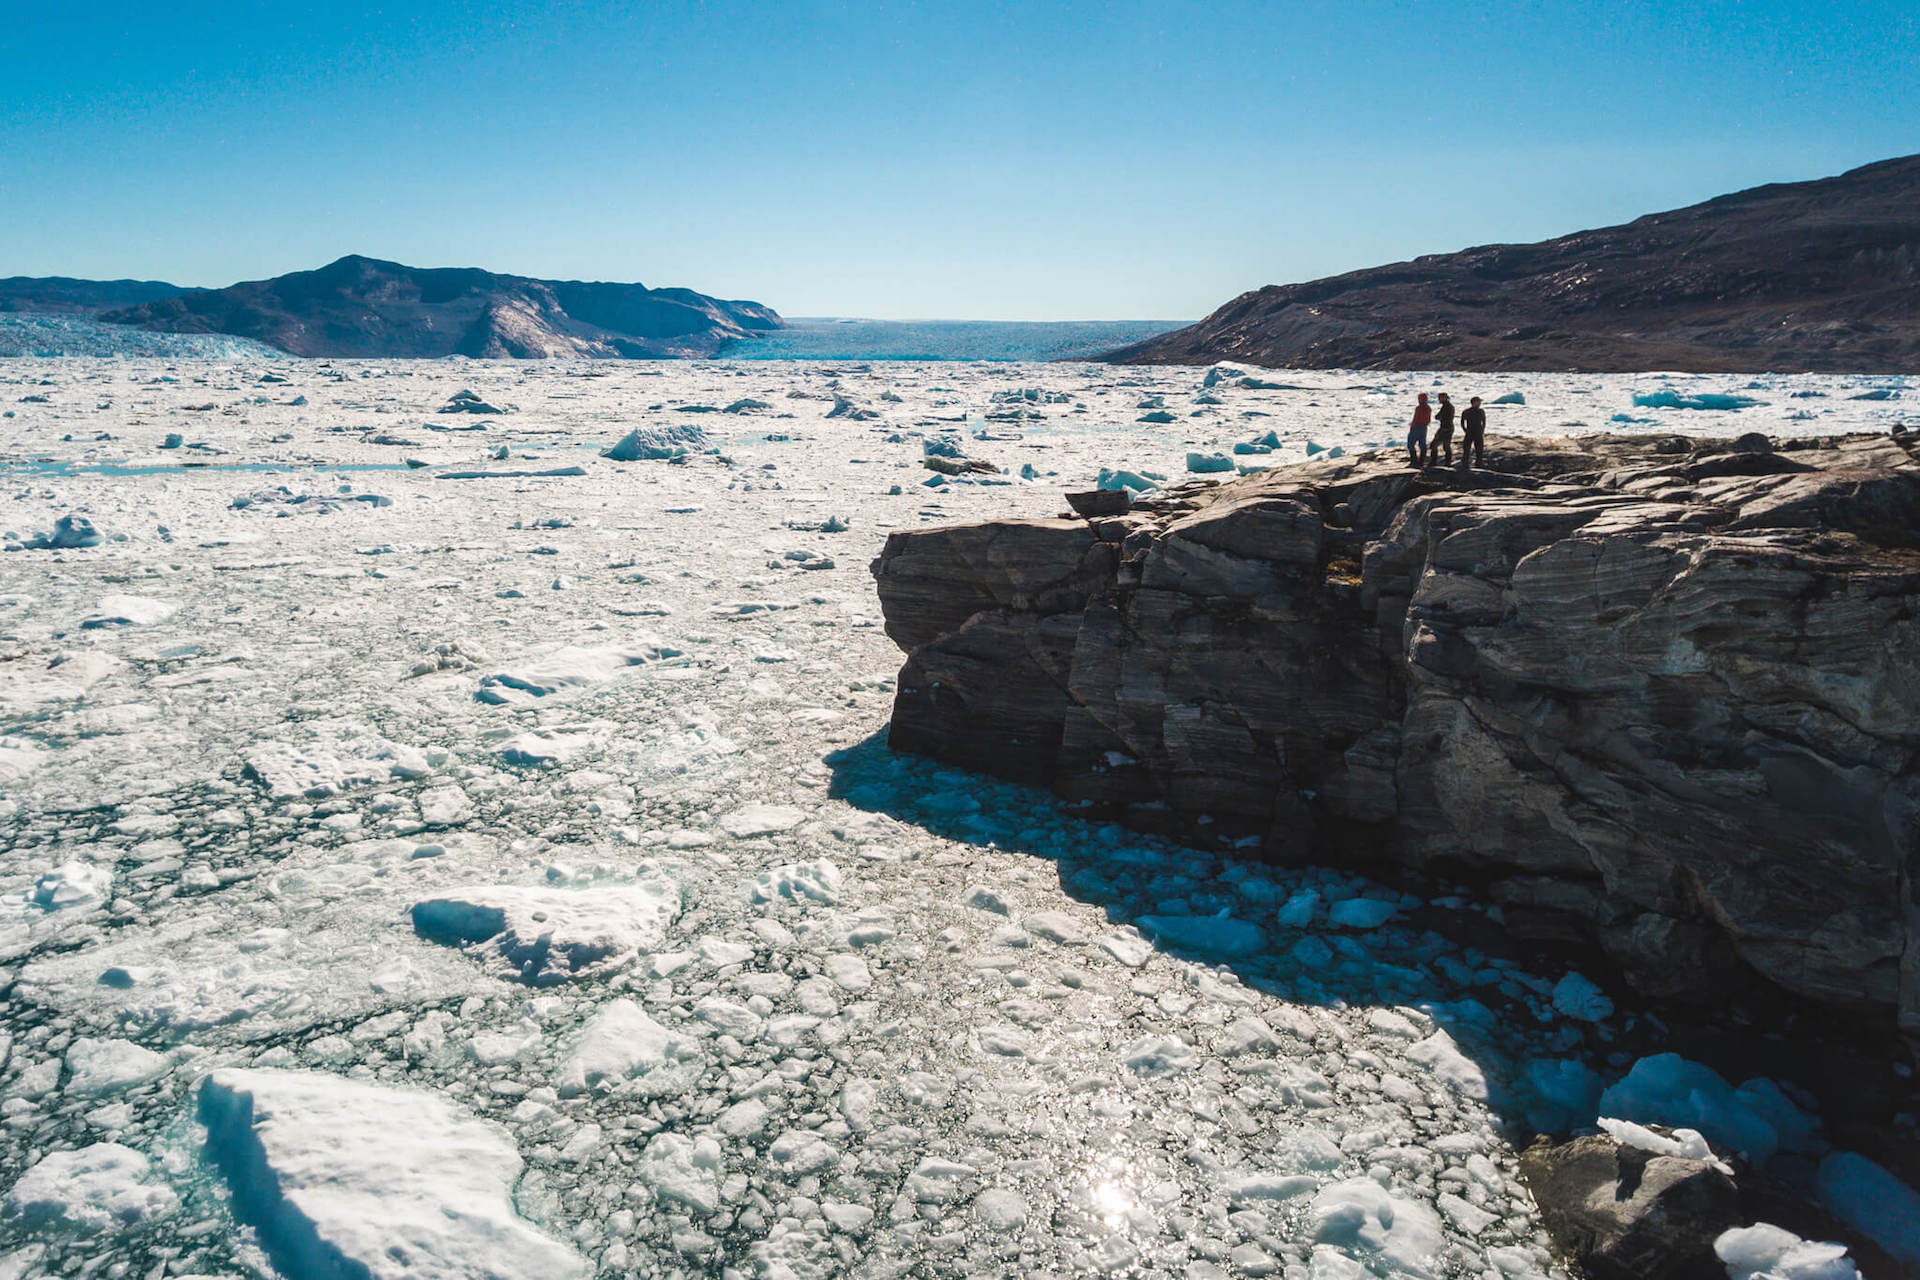 Kangiata Nunata Sermia, Greenland, 2016.